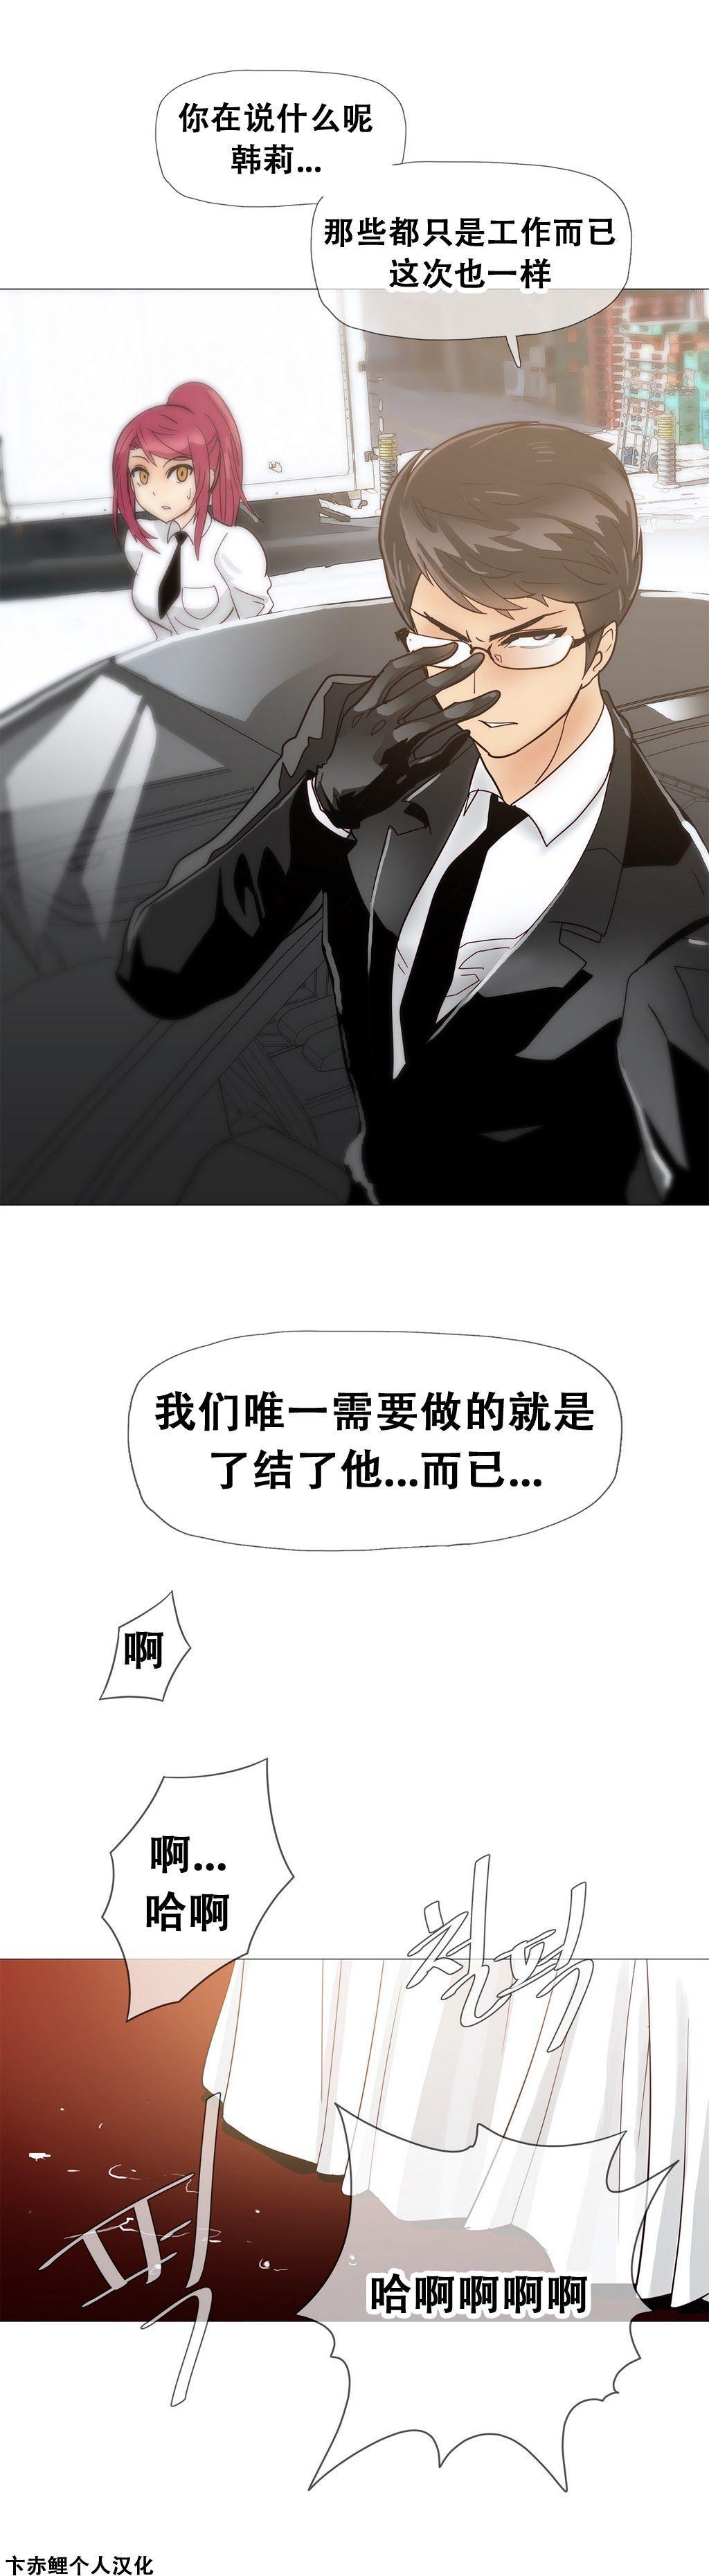 HouseHold Affairs 【卞赤鲤汉化】1~15话 300